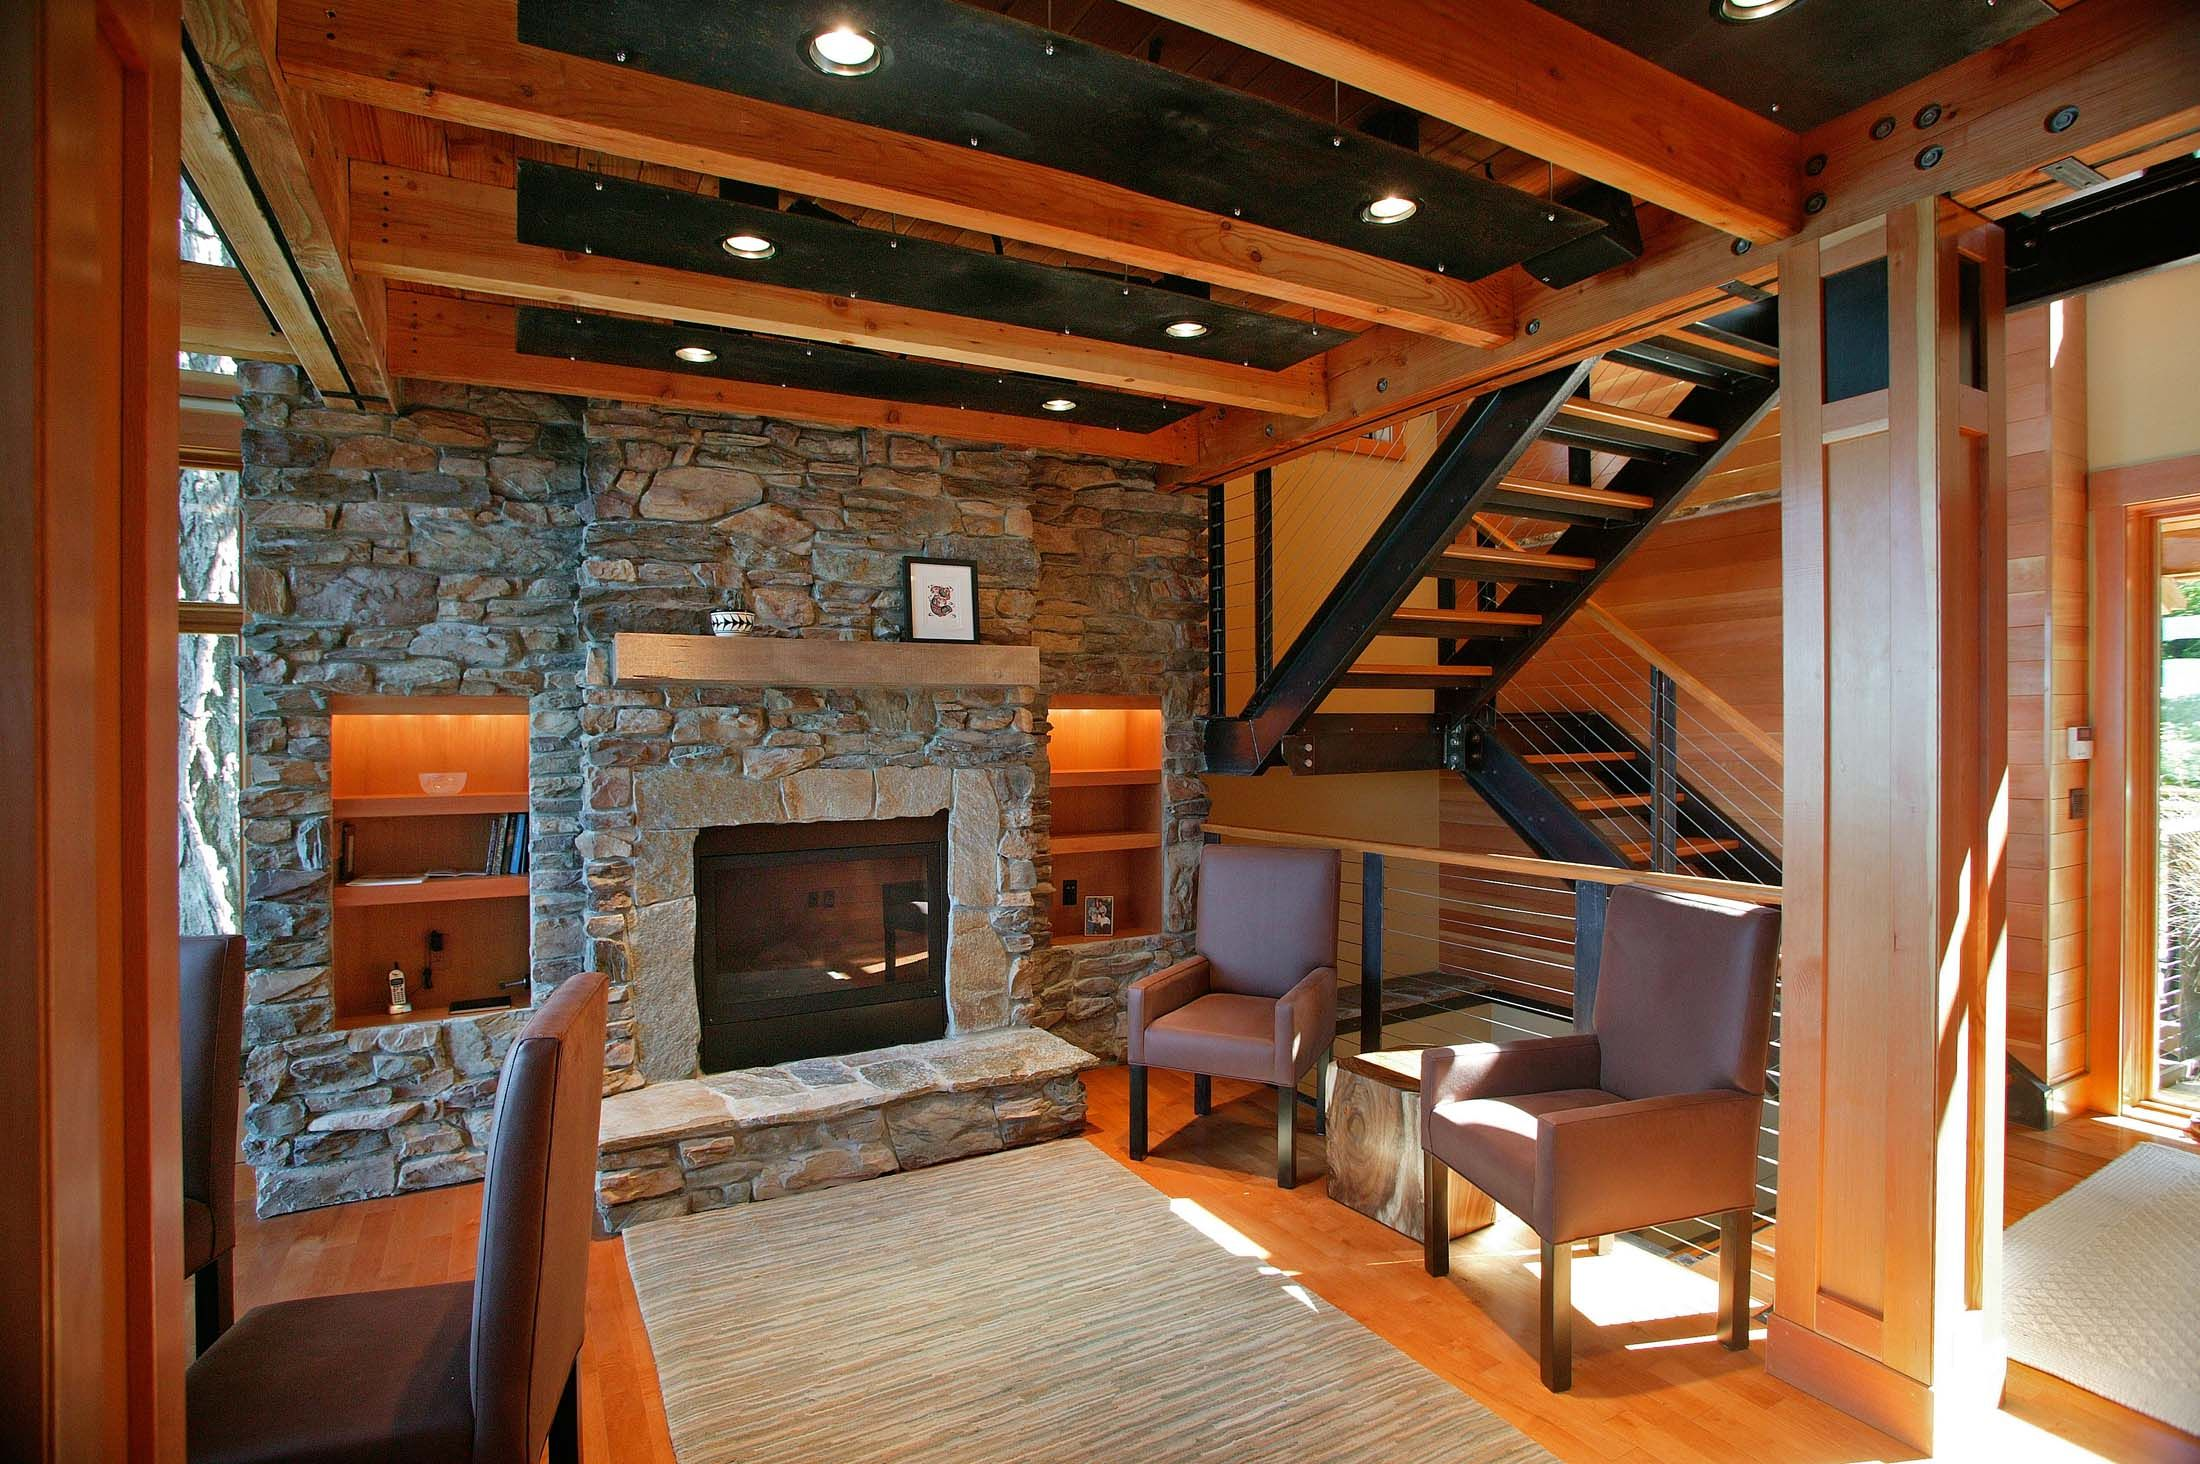 Bcra seattle office bcra office redesign house - Restaurant interior design seattle ...